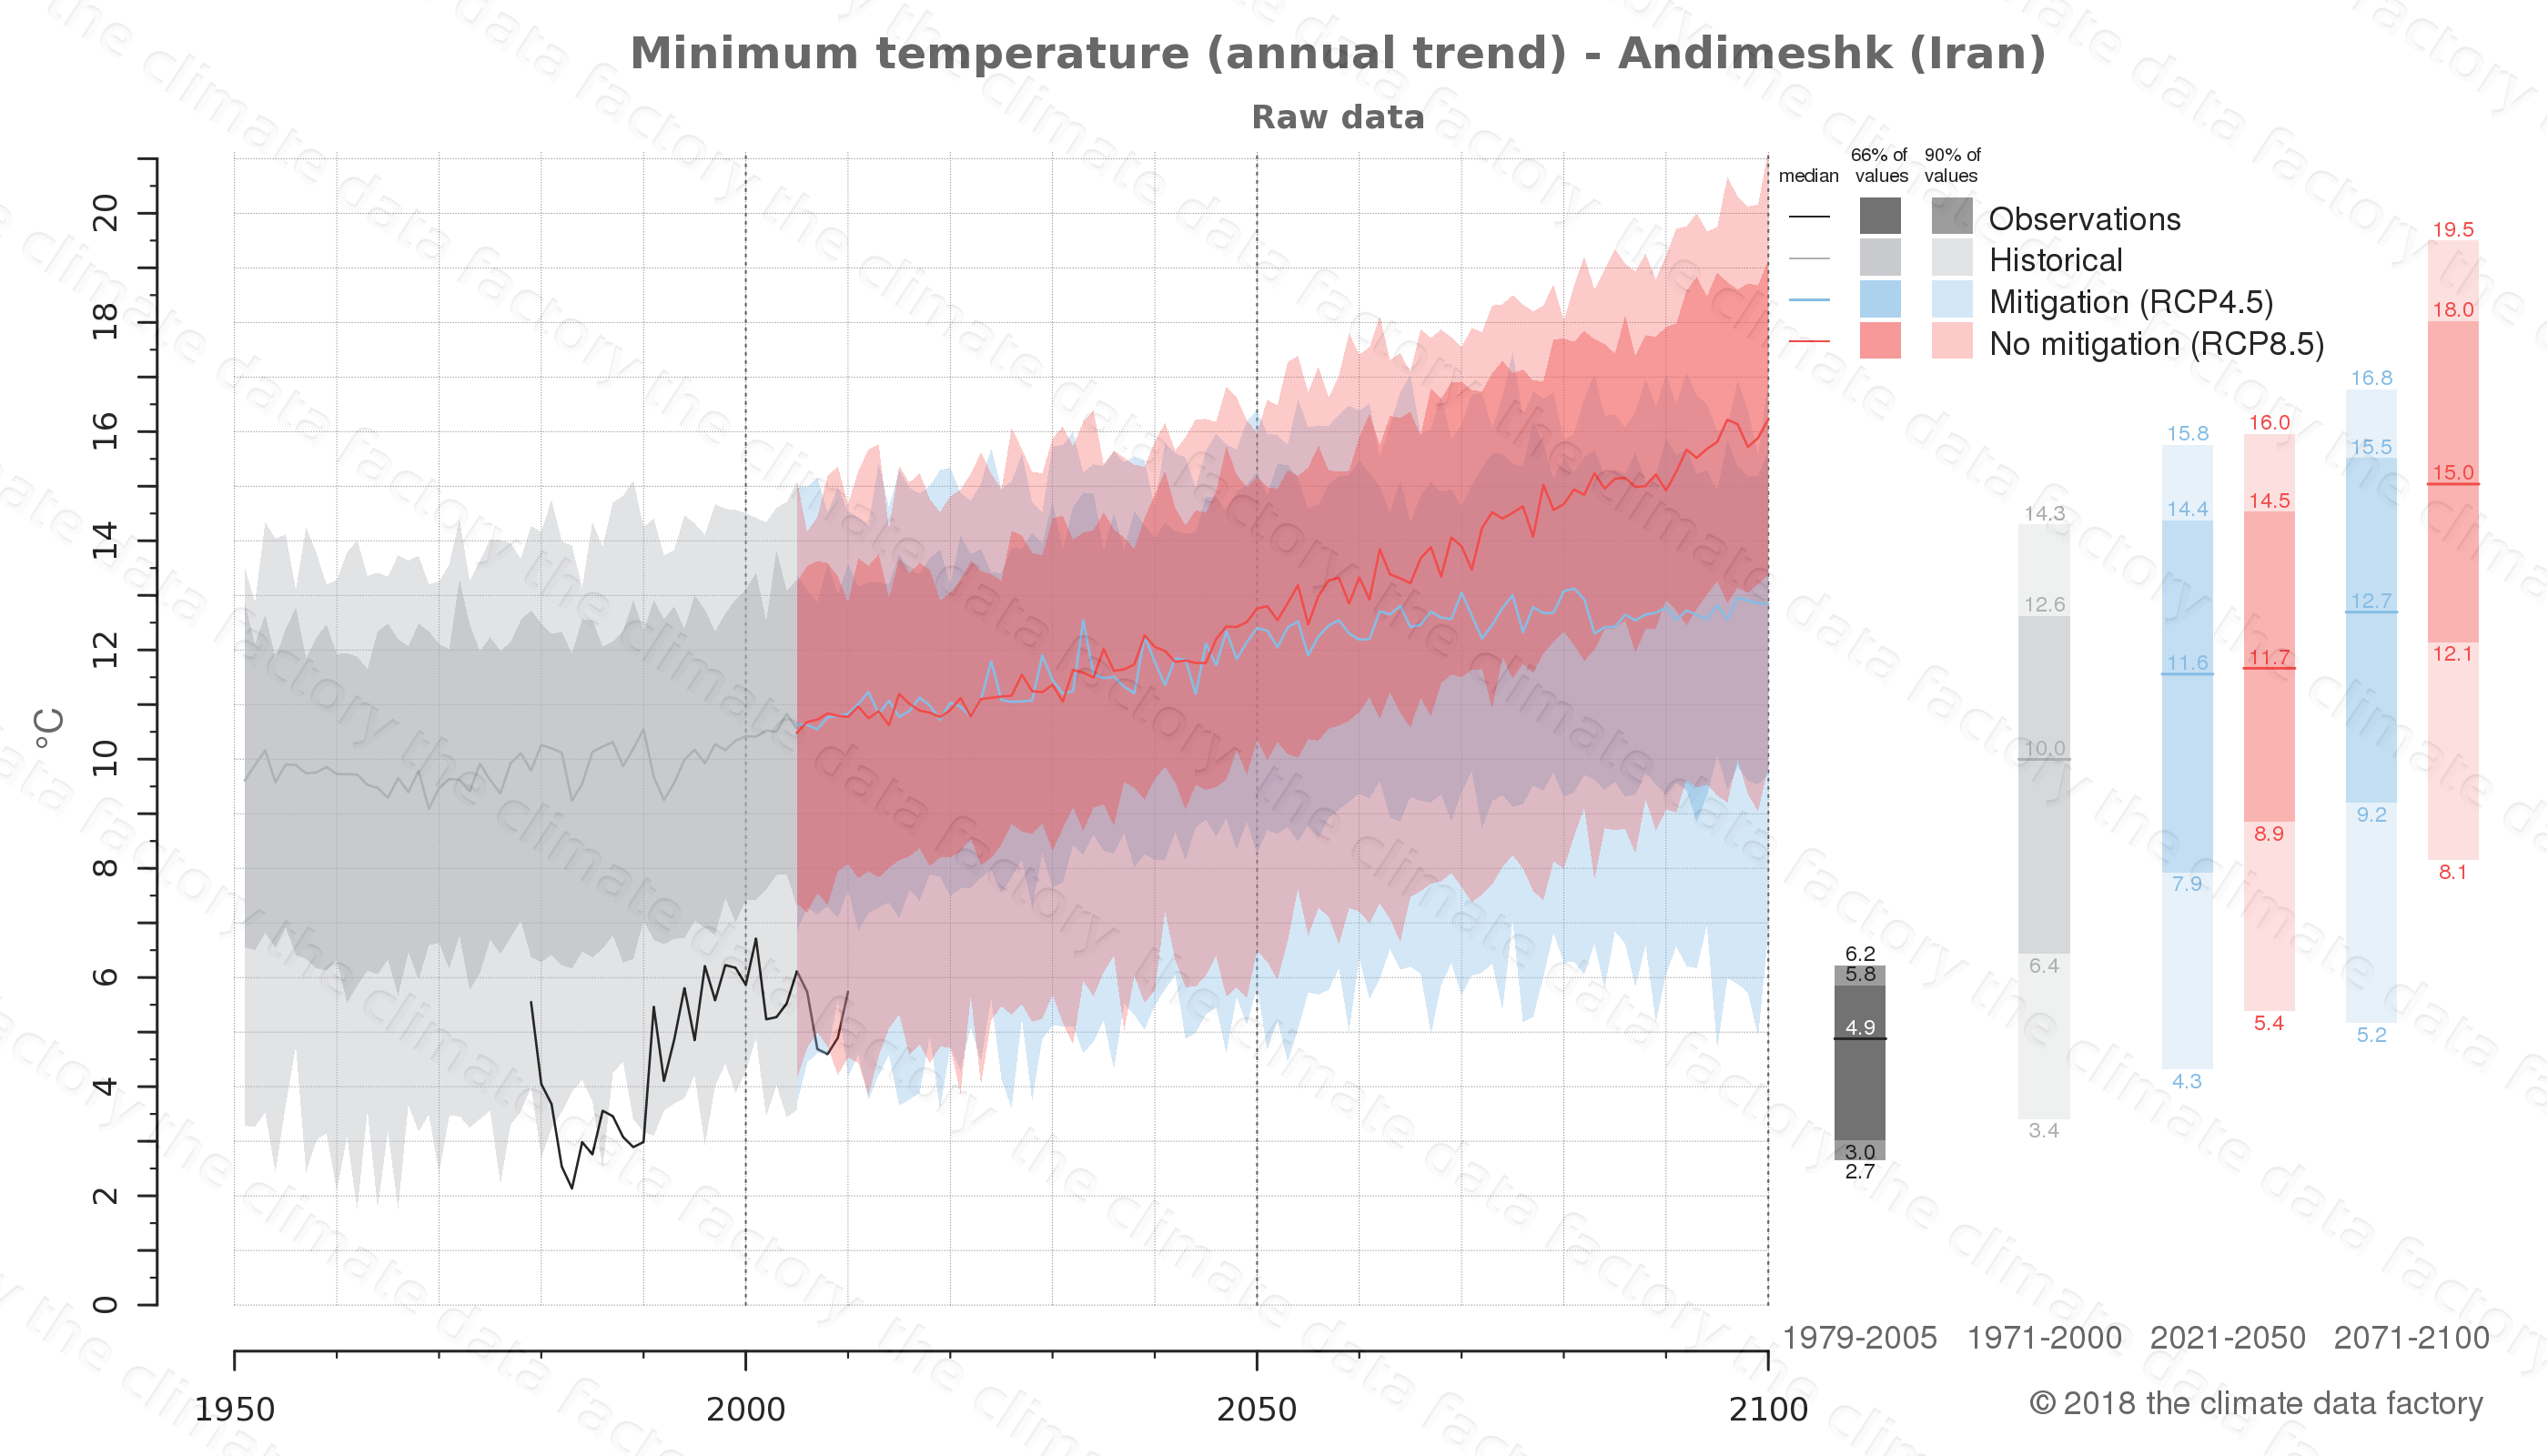 climate change data policy adaptation climate graph city data minimum-temperature andimeshk iran